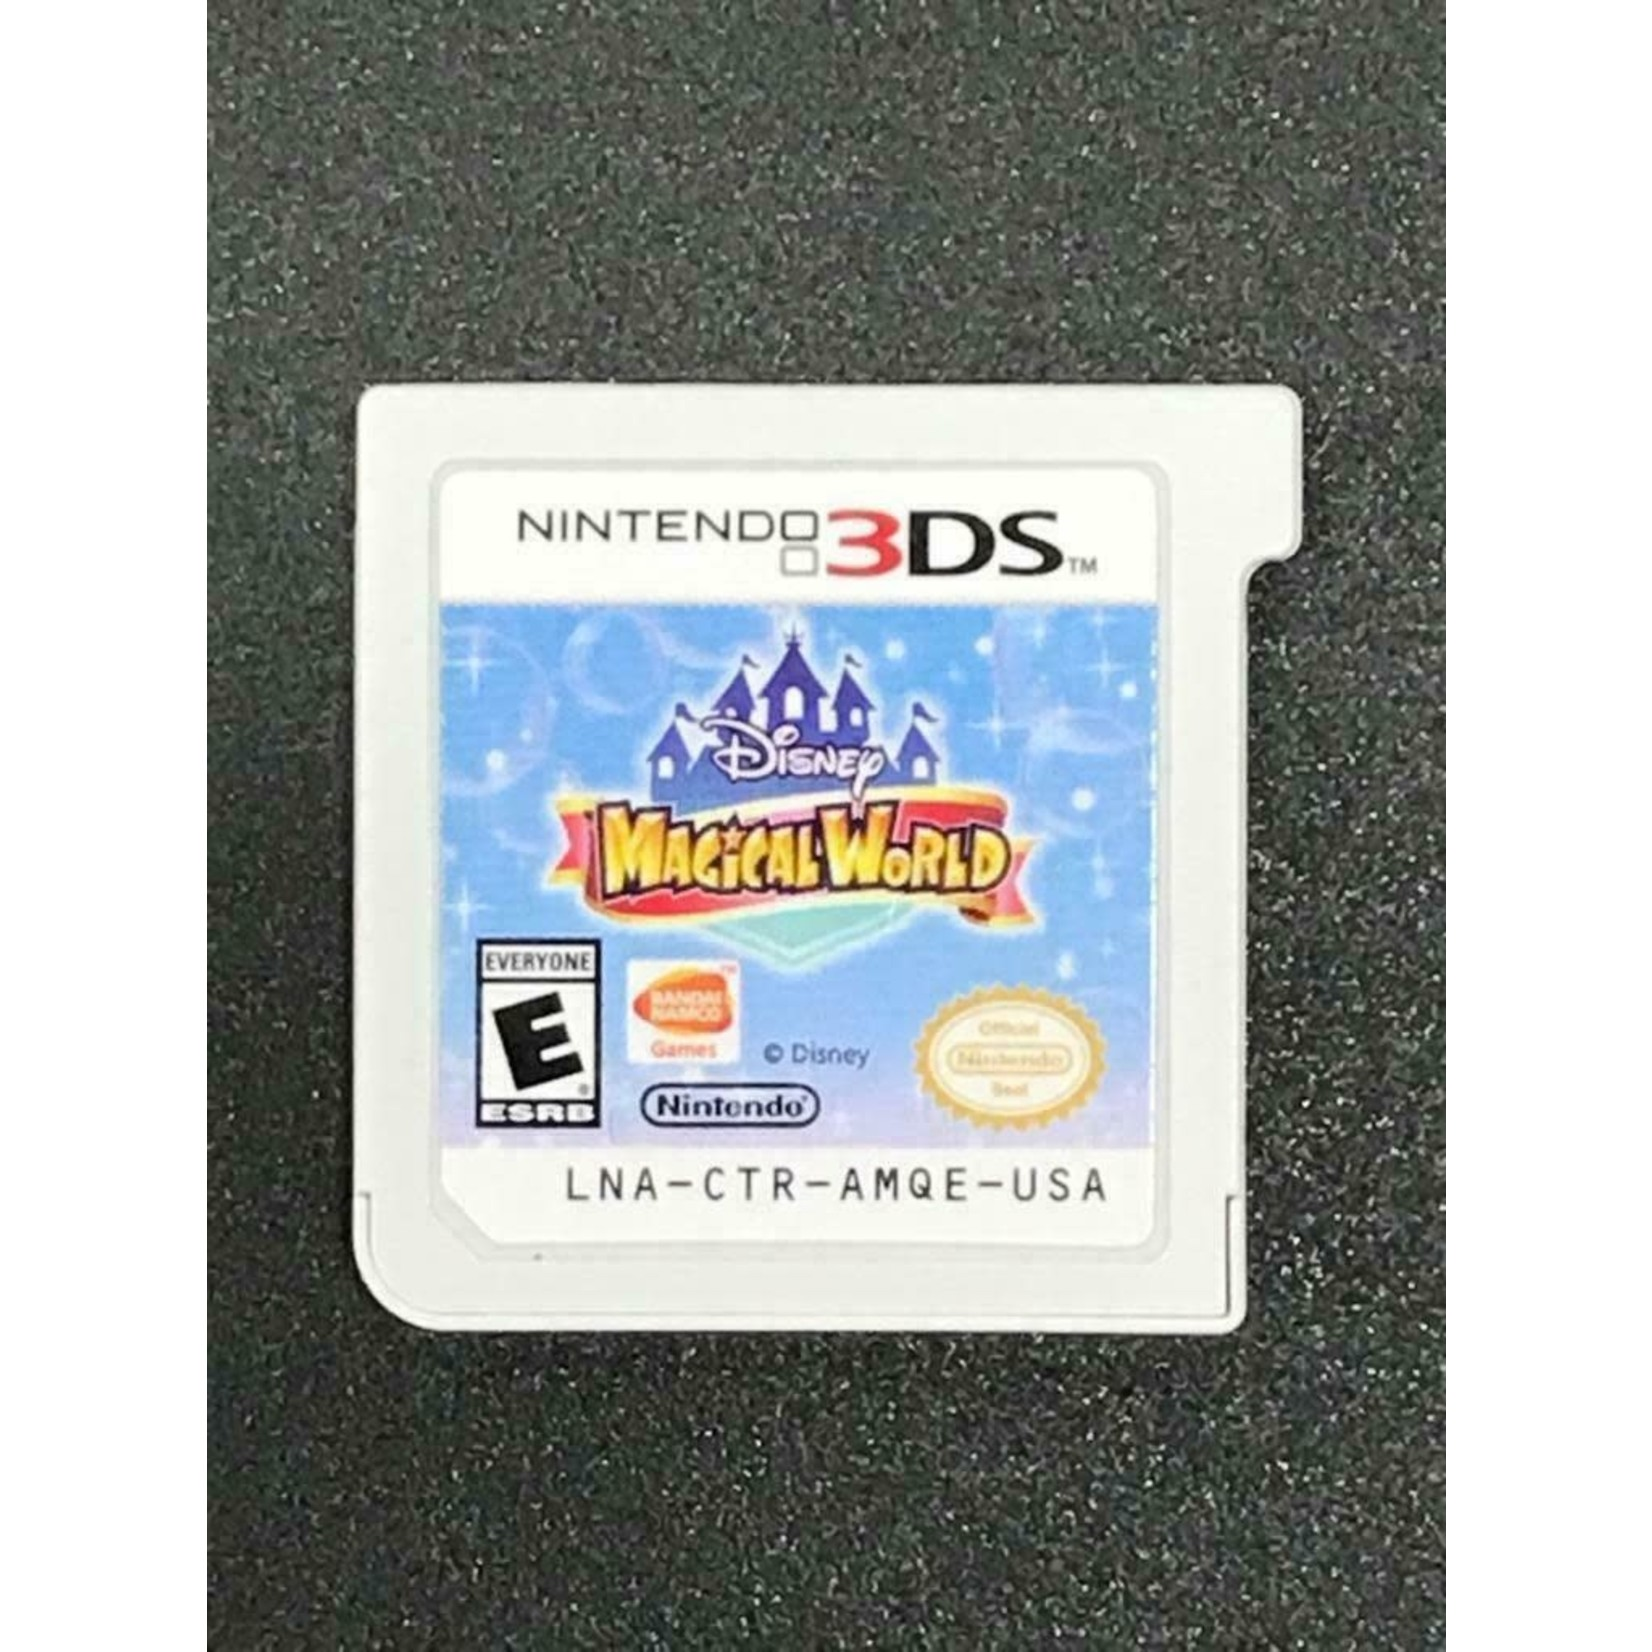 3DSu-Disney Magical World (chip only)